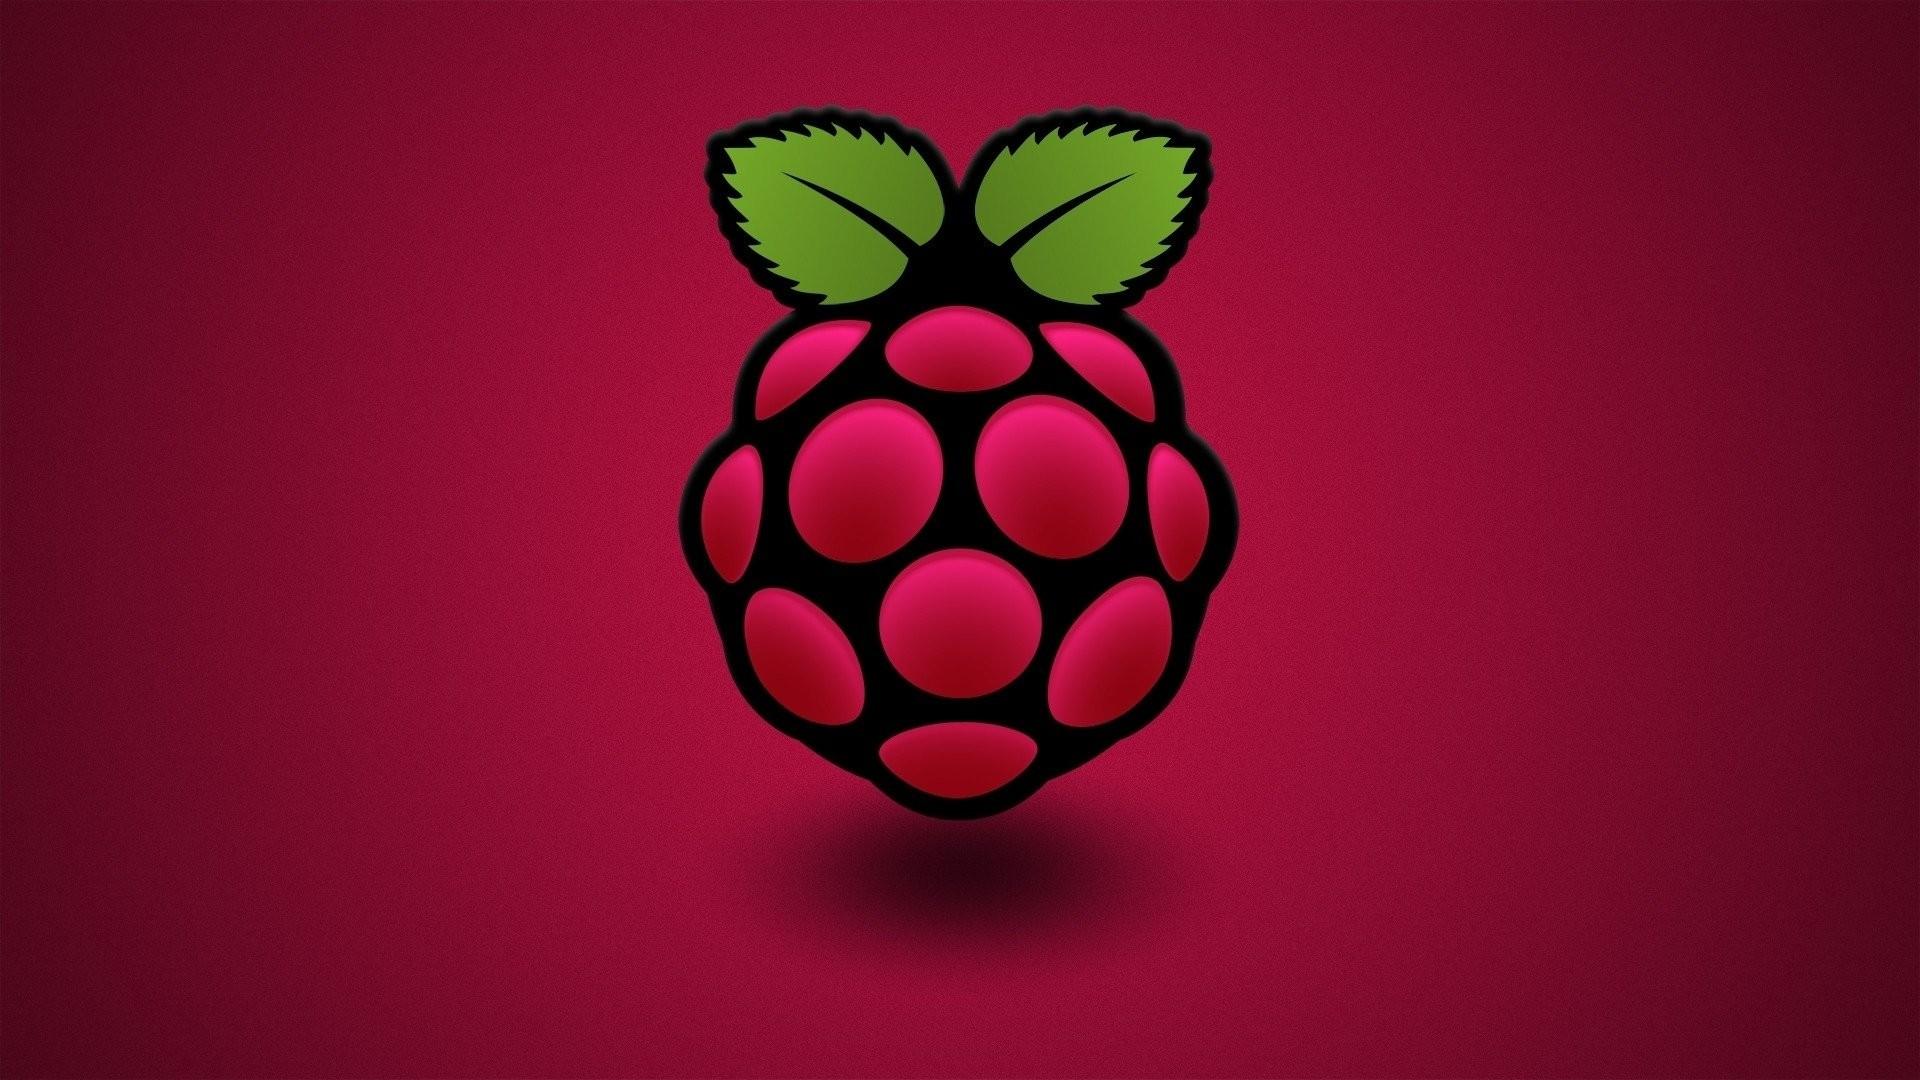 Raspberry pi image download